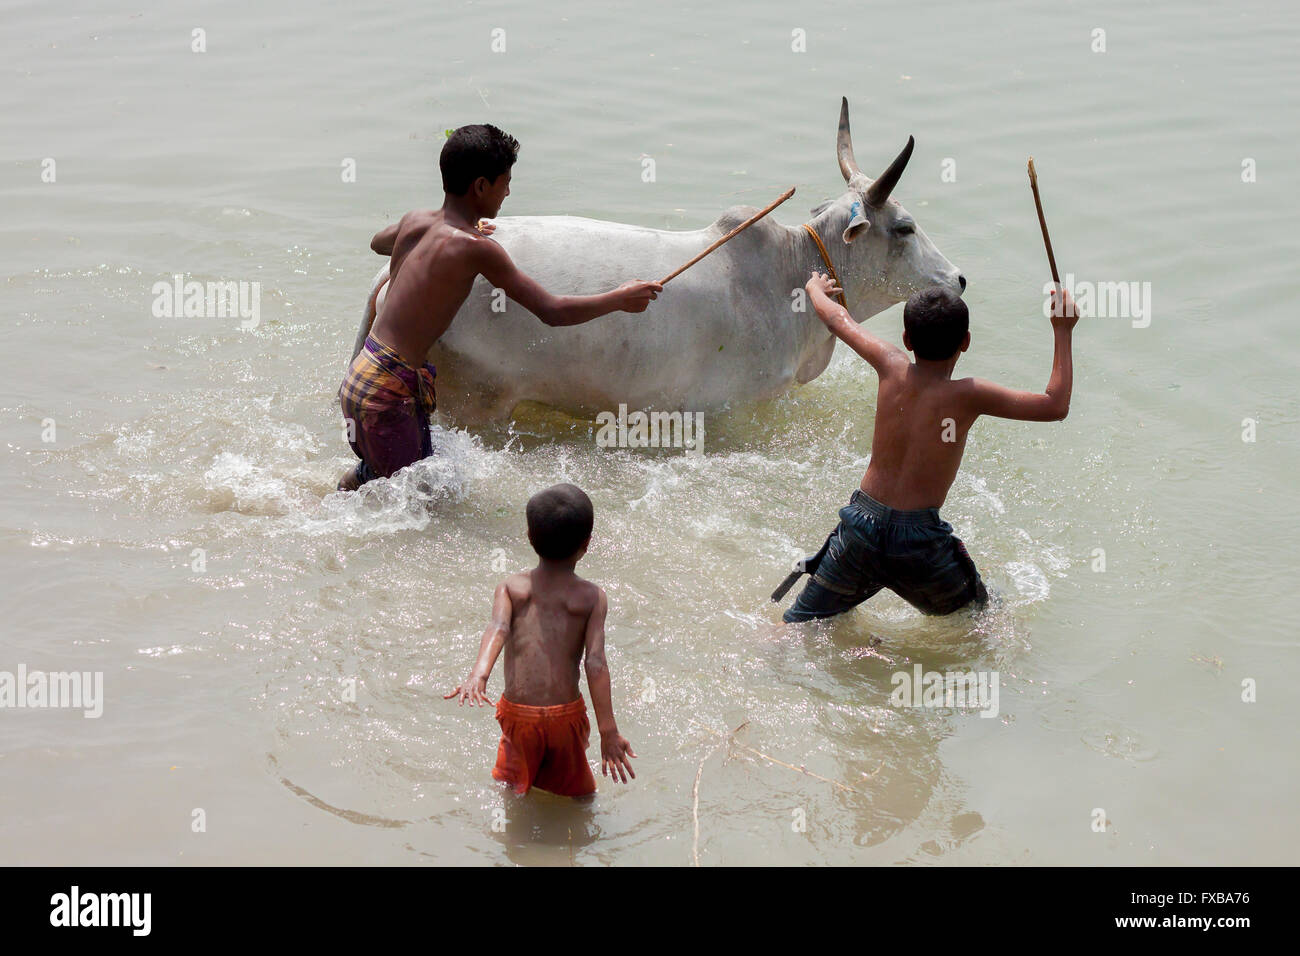 Father and child washing a cow, Dohar, outside of Dhaka, Bangladesh © Jahangir Alam Onuchcha/Alamy - Stock Image